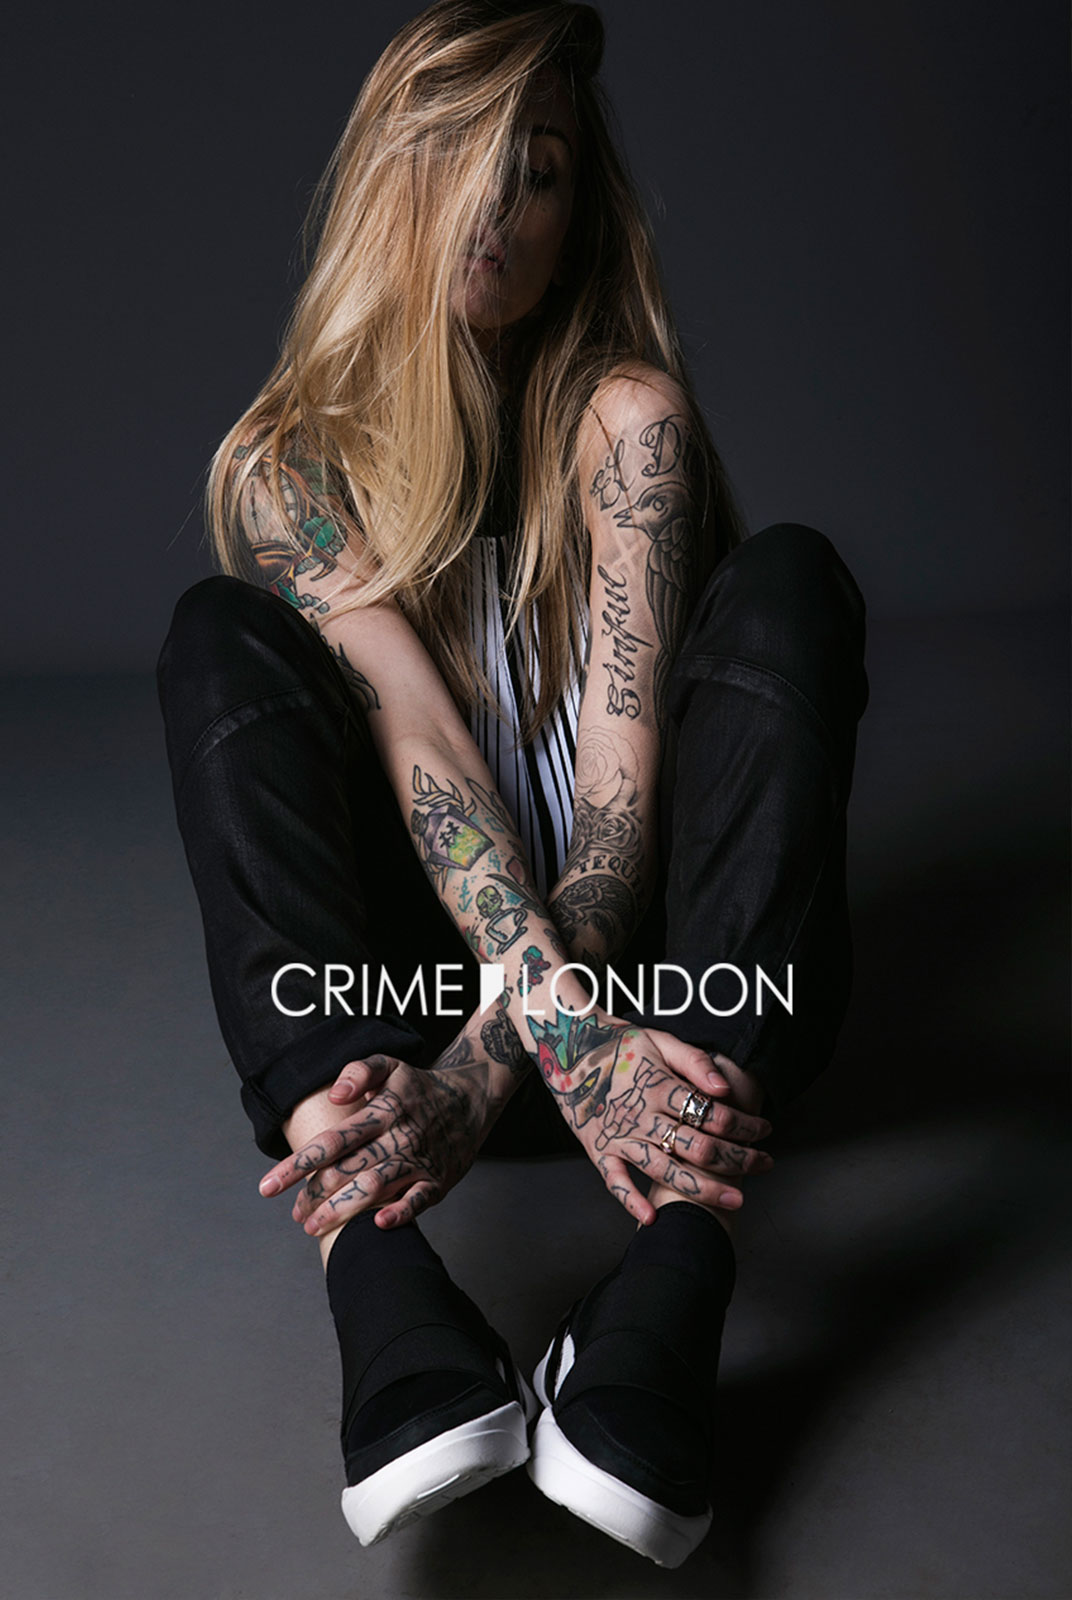 Crime_London_03